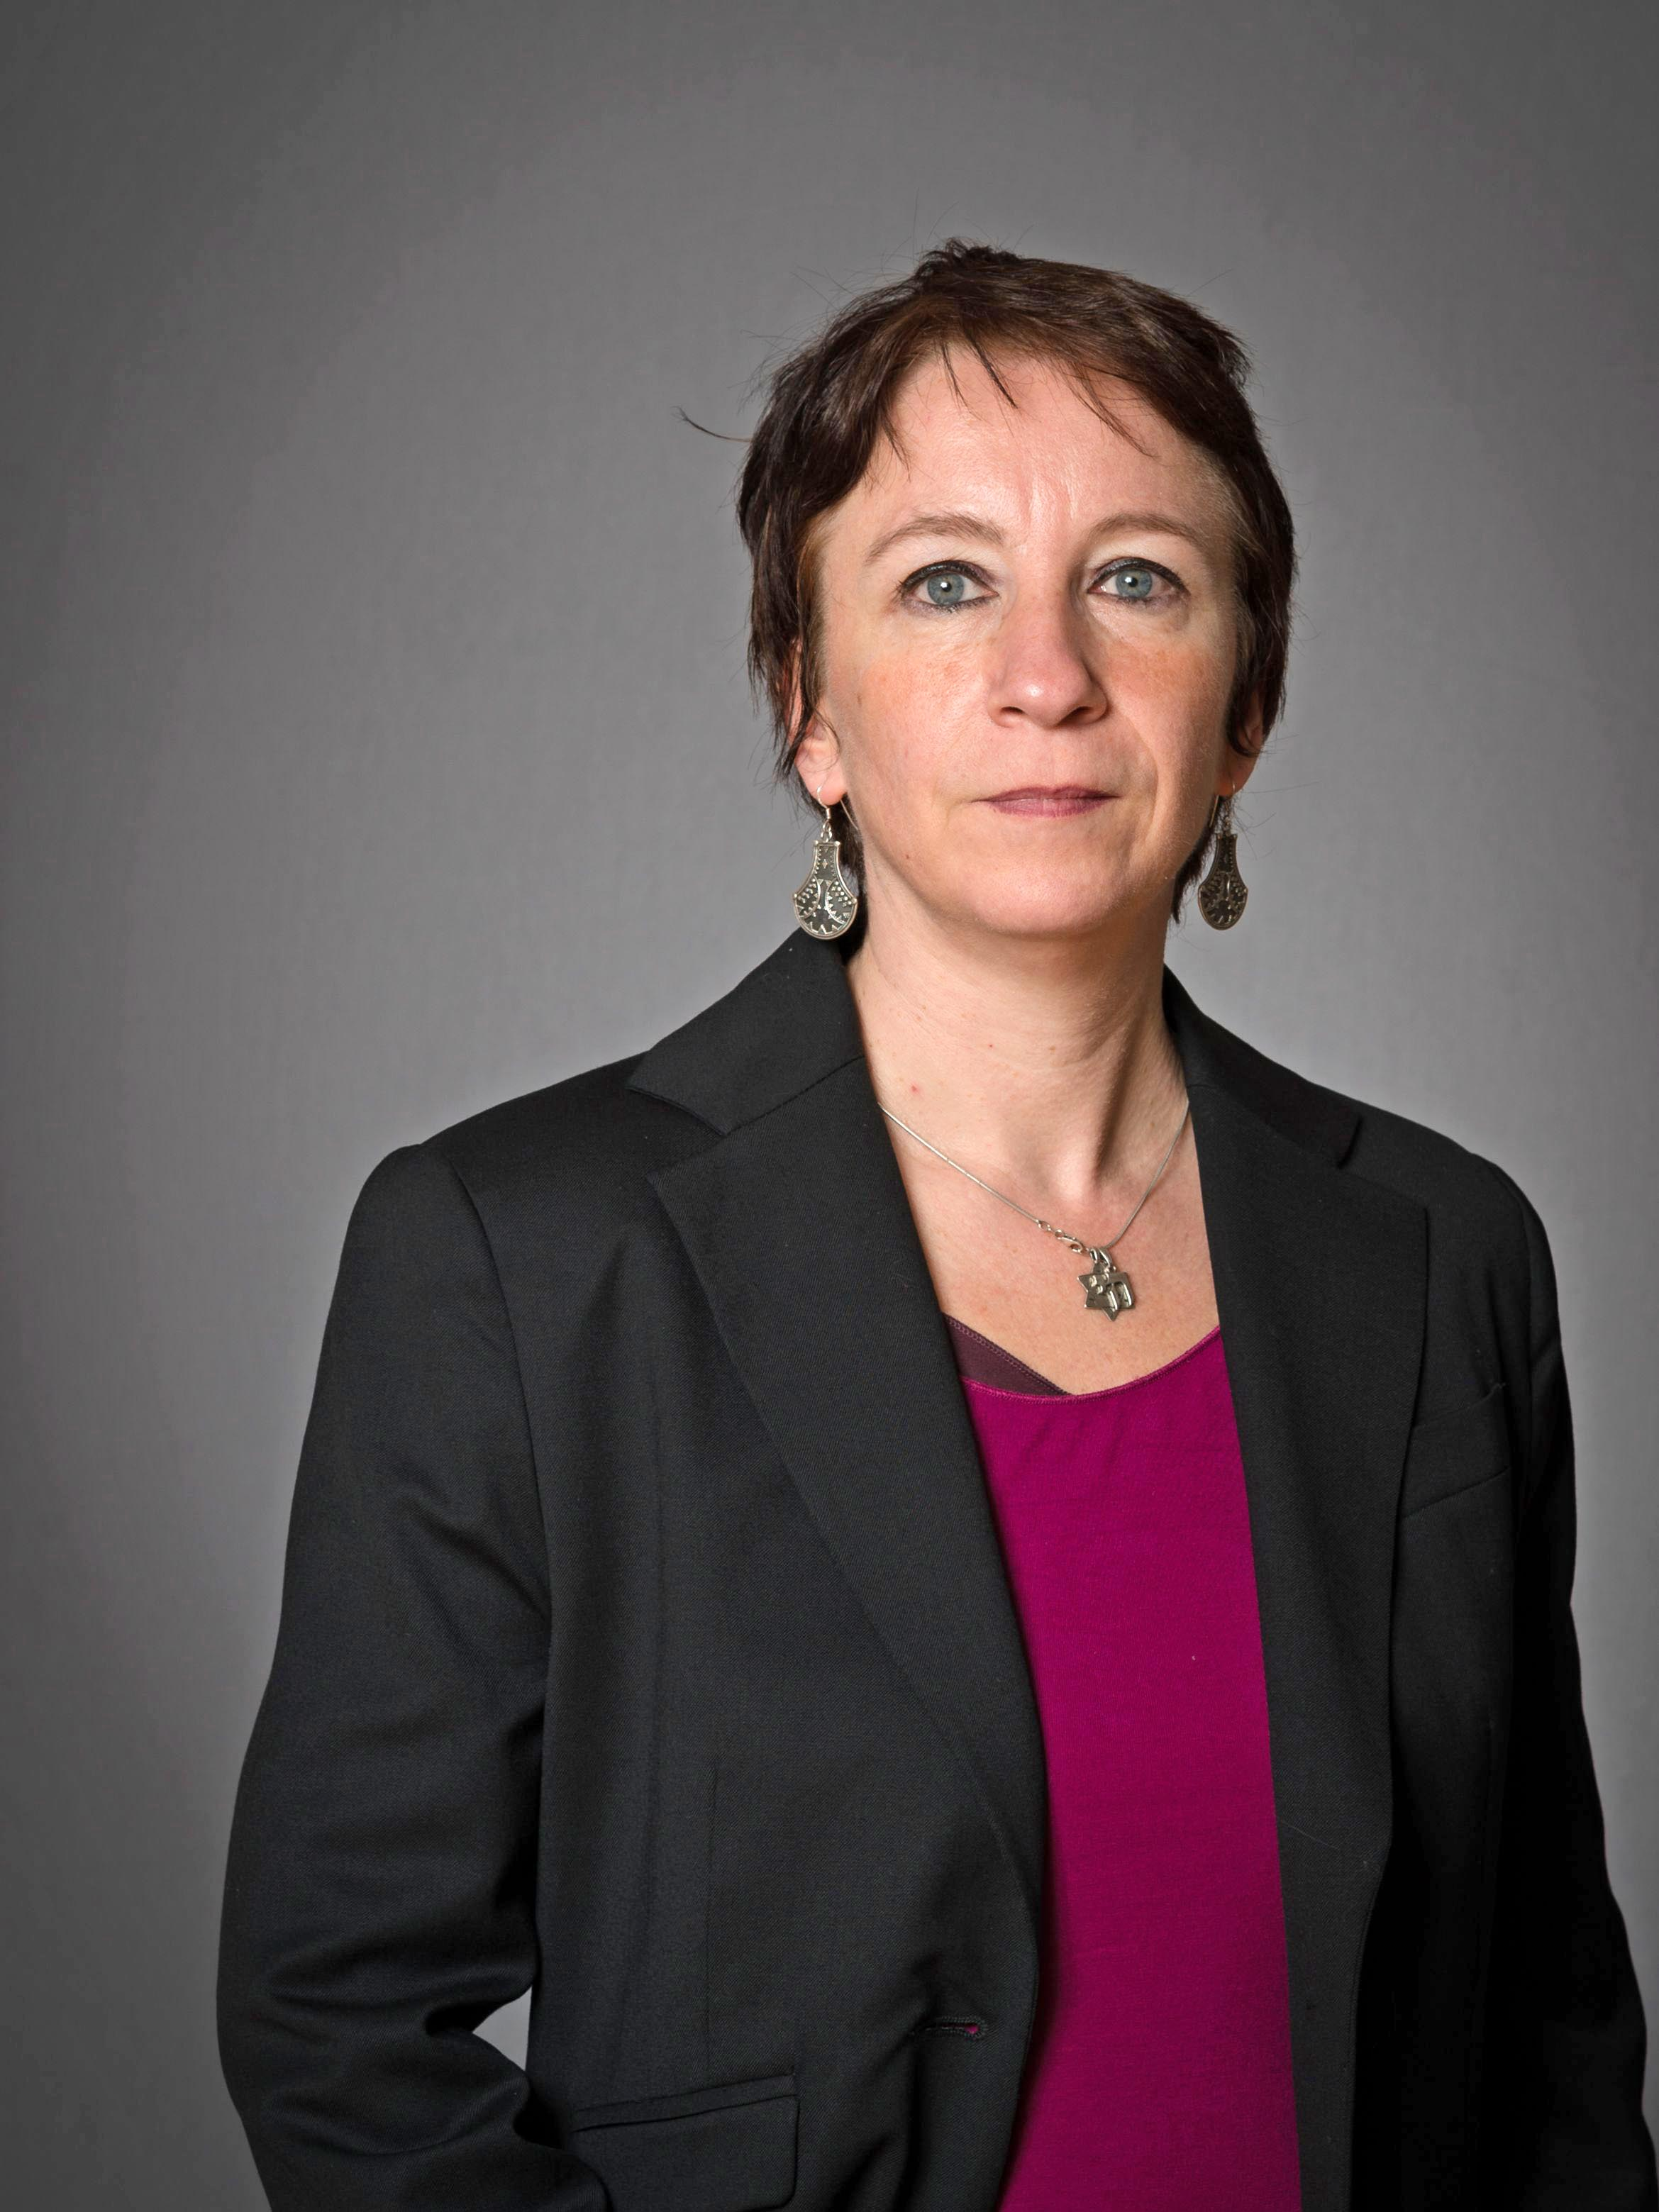 Prof. Dr. Susanne Talabardon